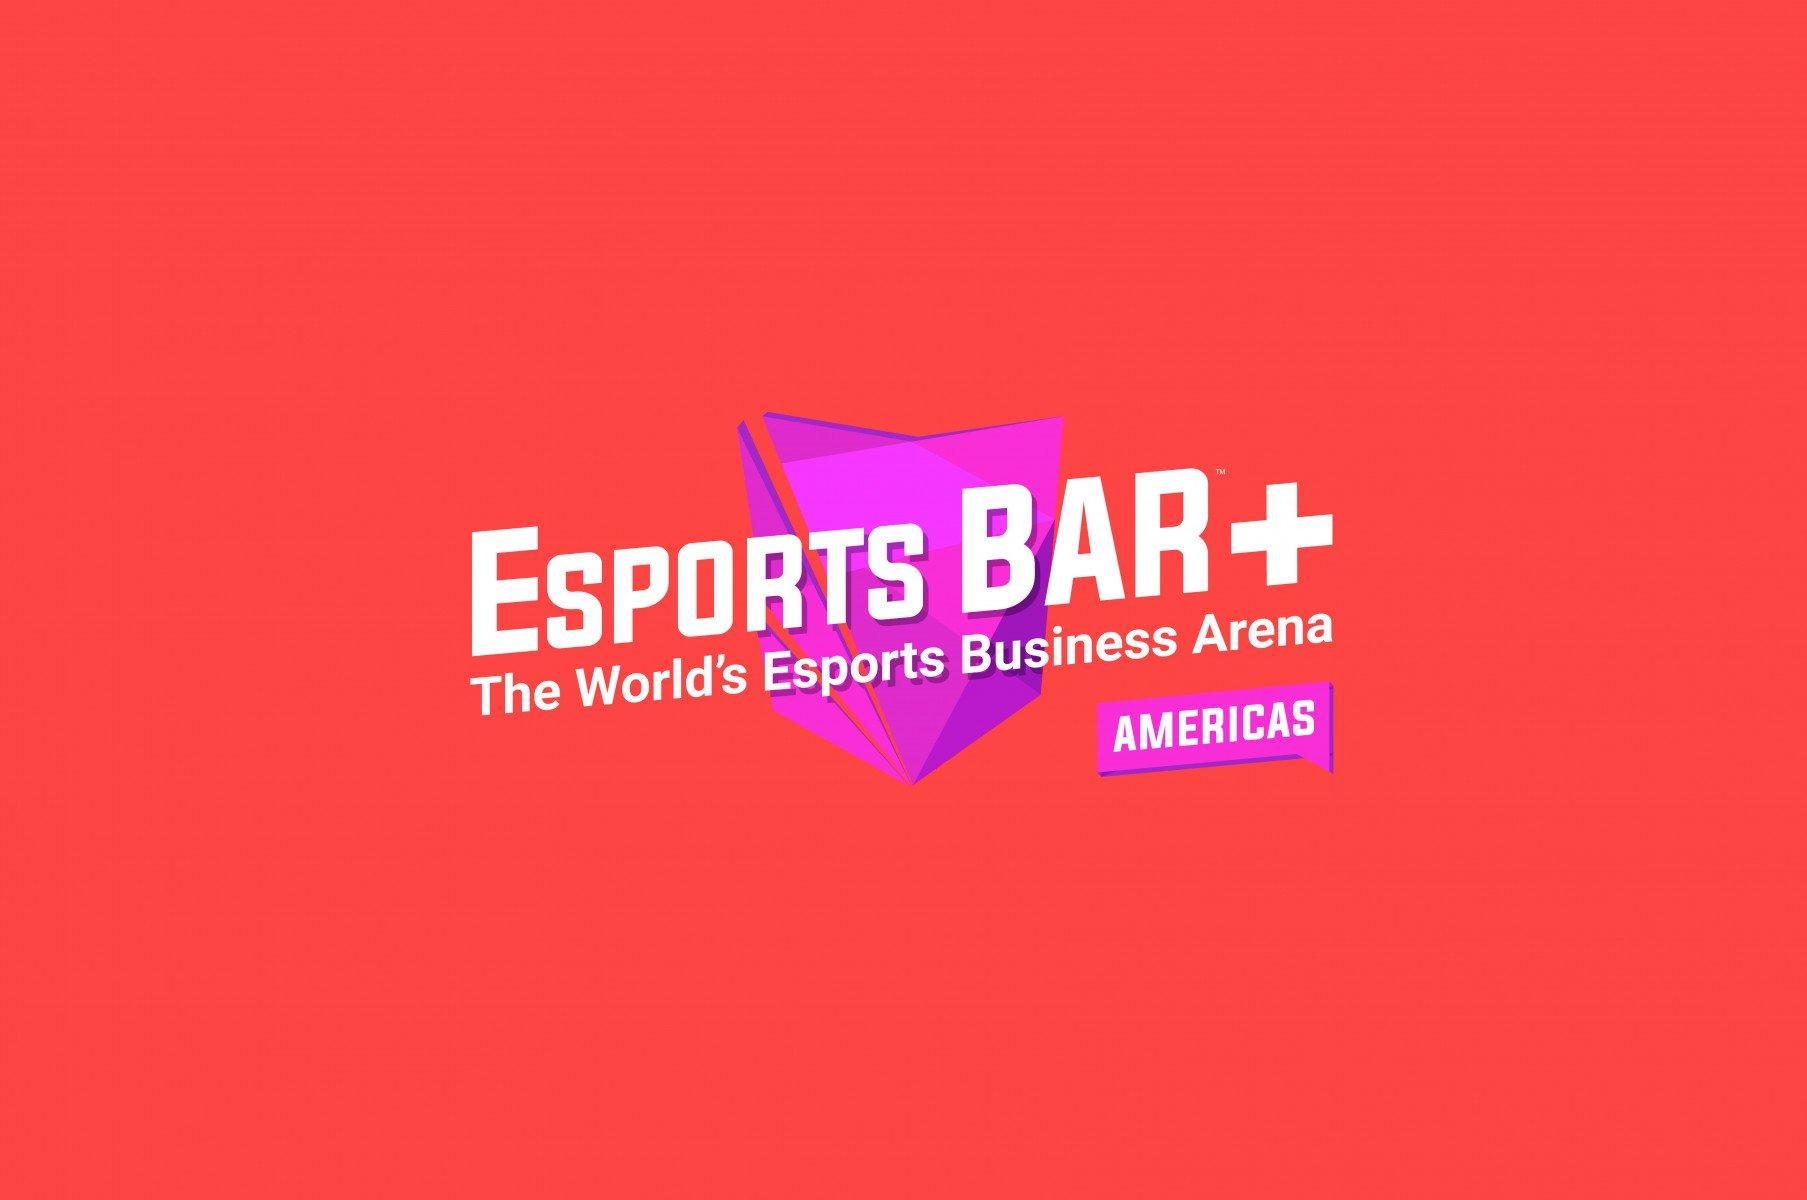 Esports BAR Education